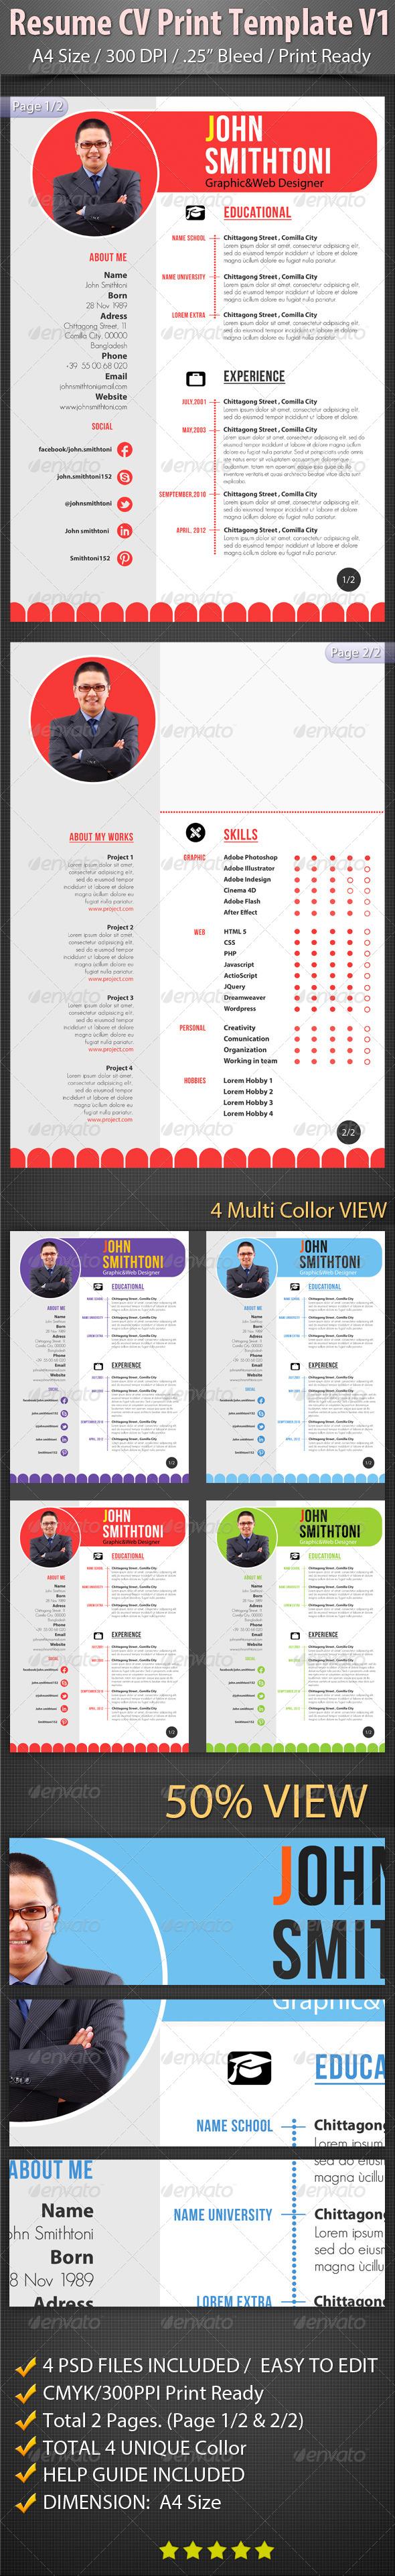 Resume CV Print Template V1 - Resumes Stationery